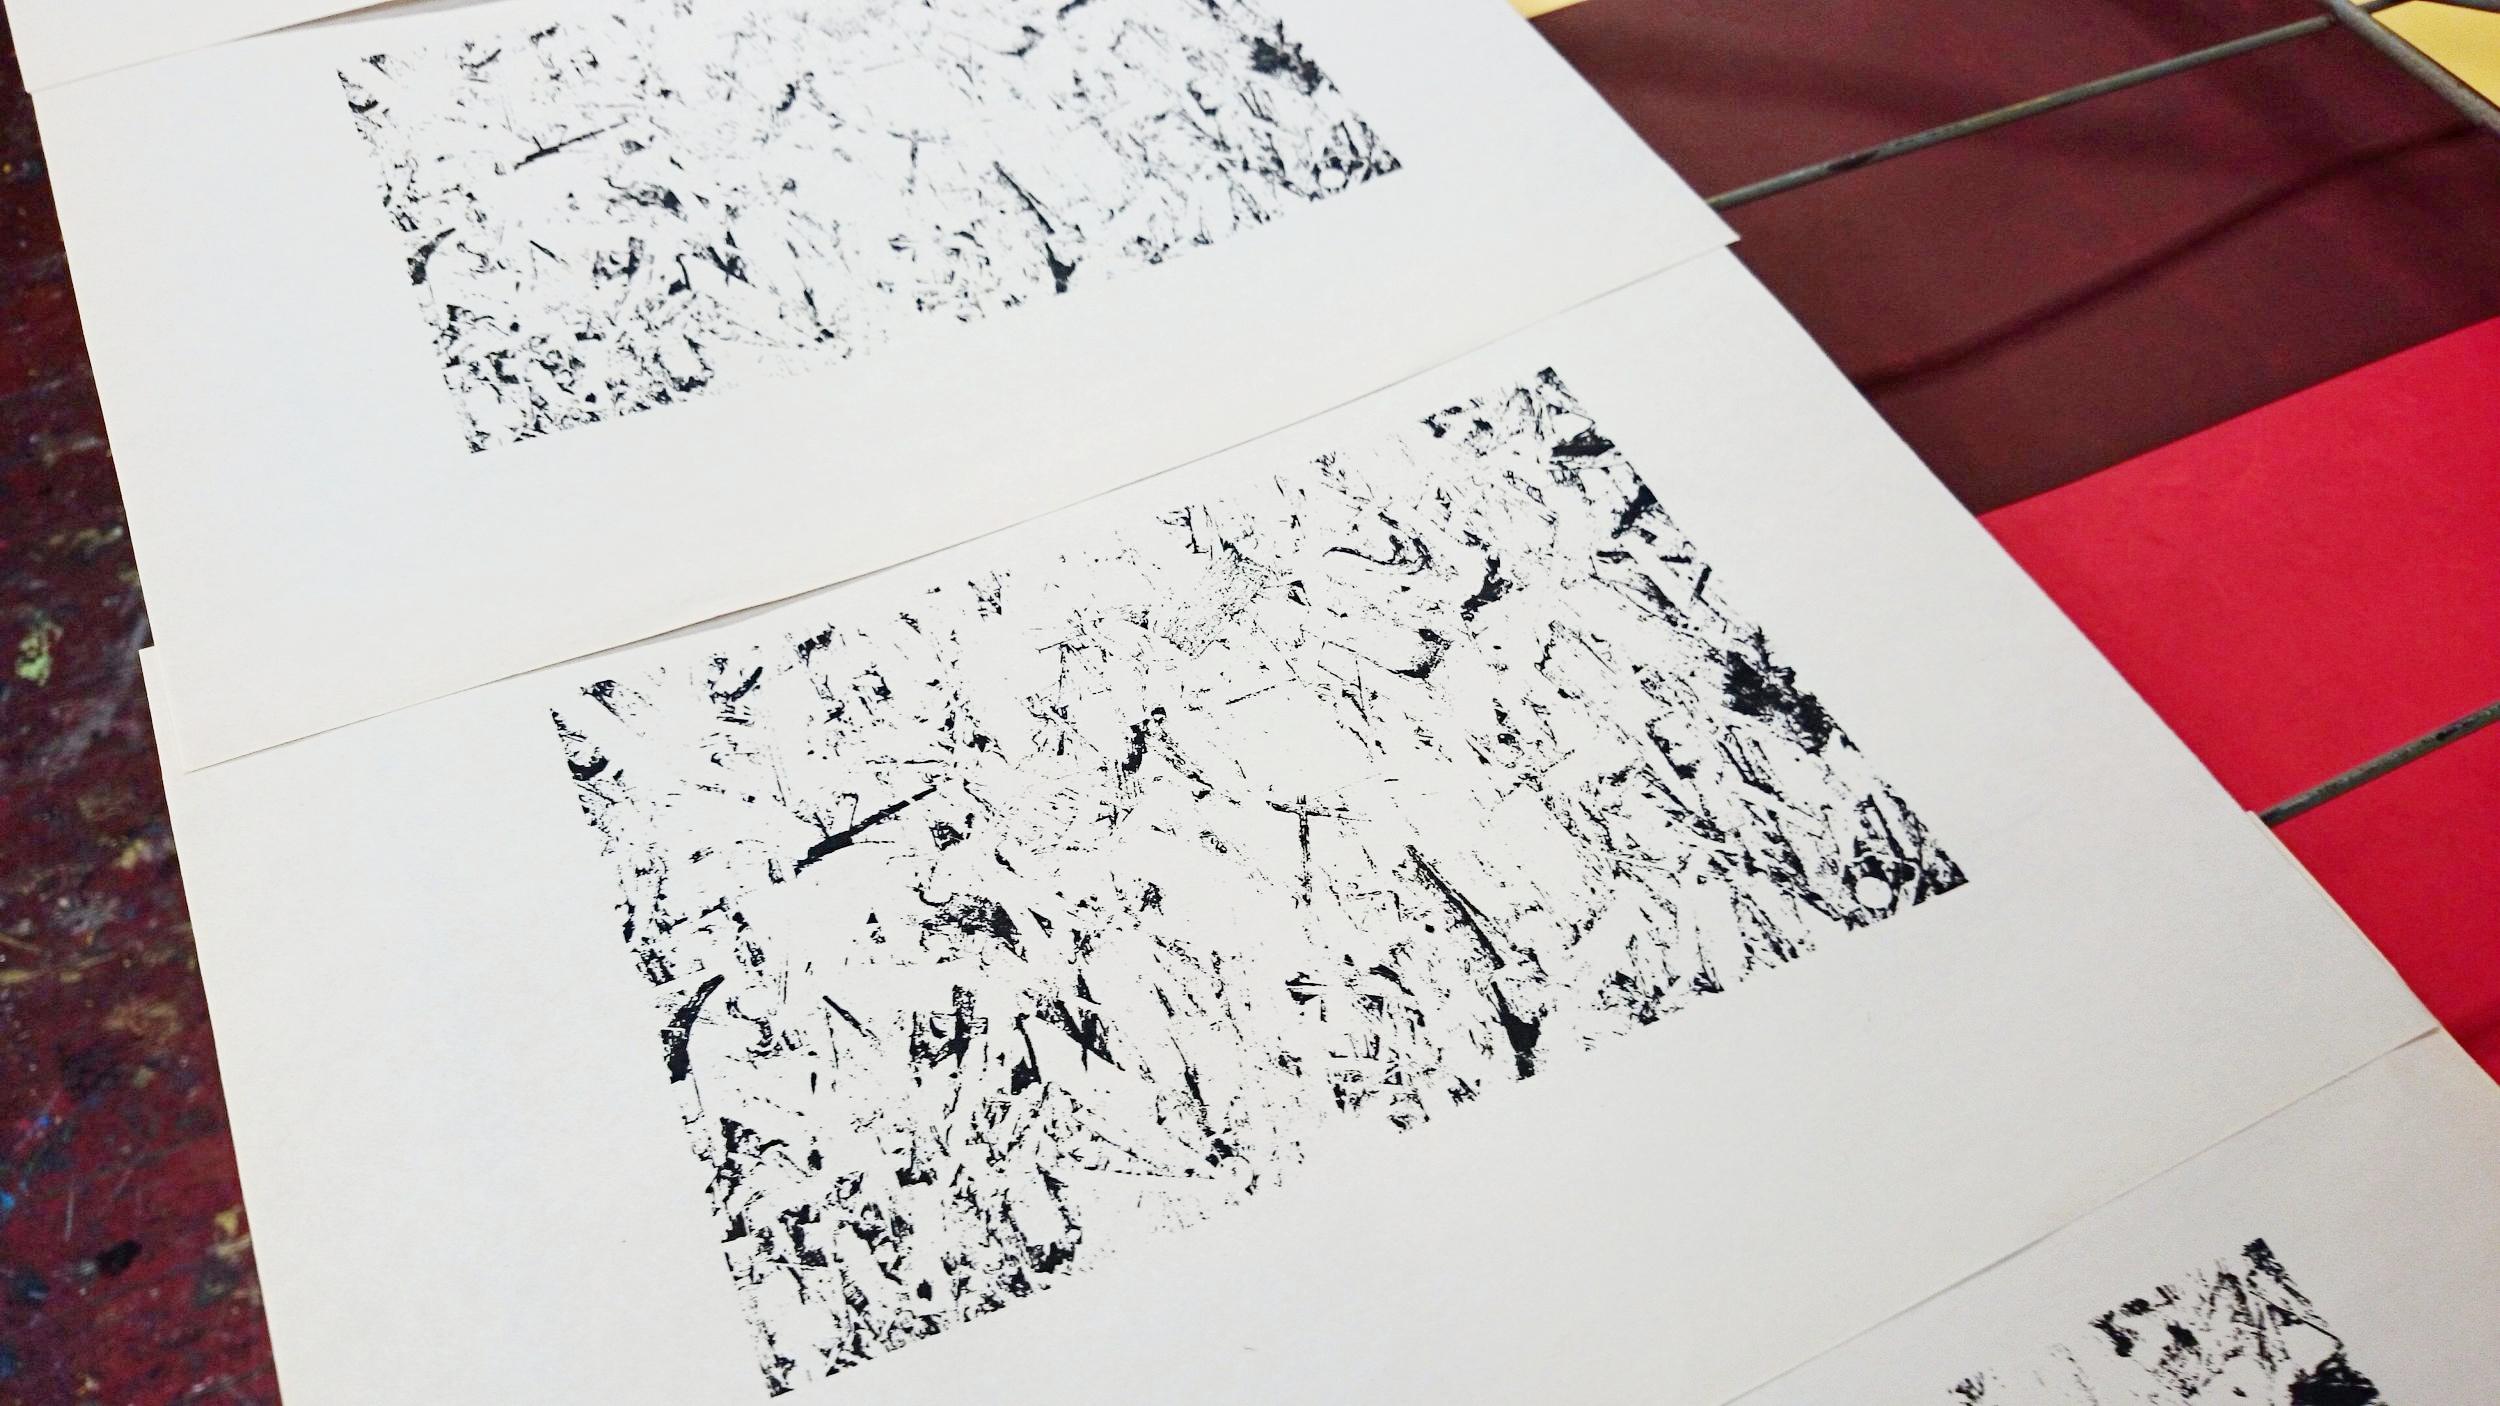 Layer 1 artwork in black printed on newsprint paper.